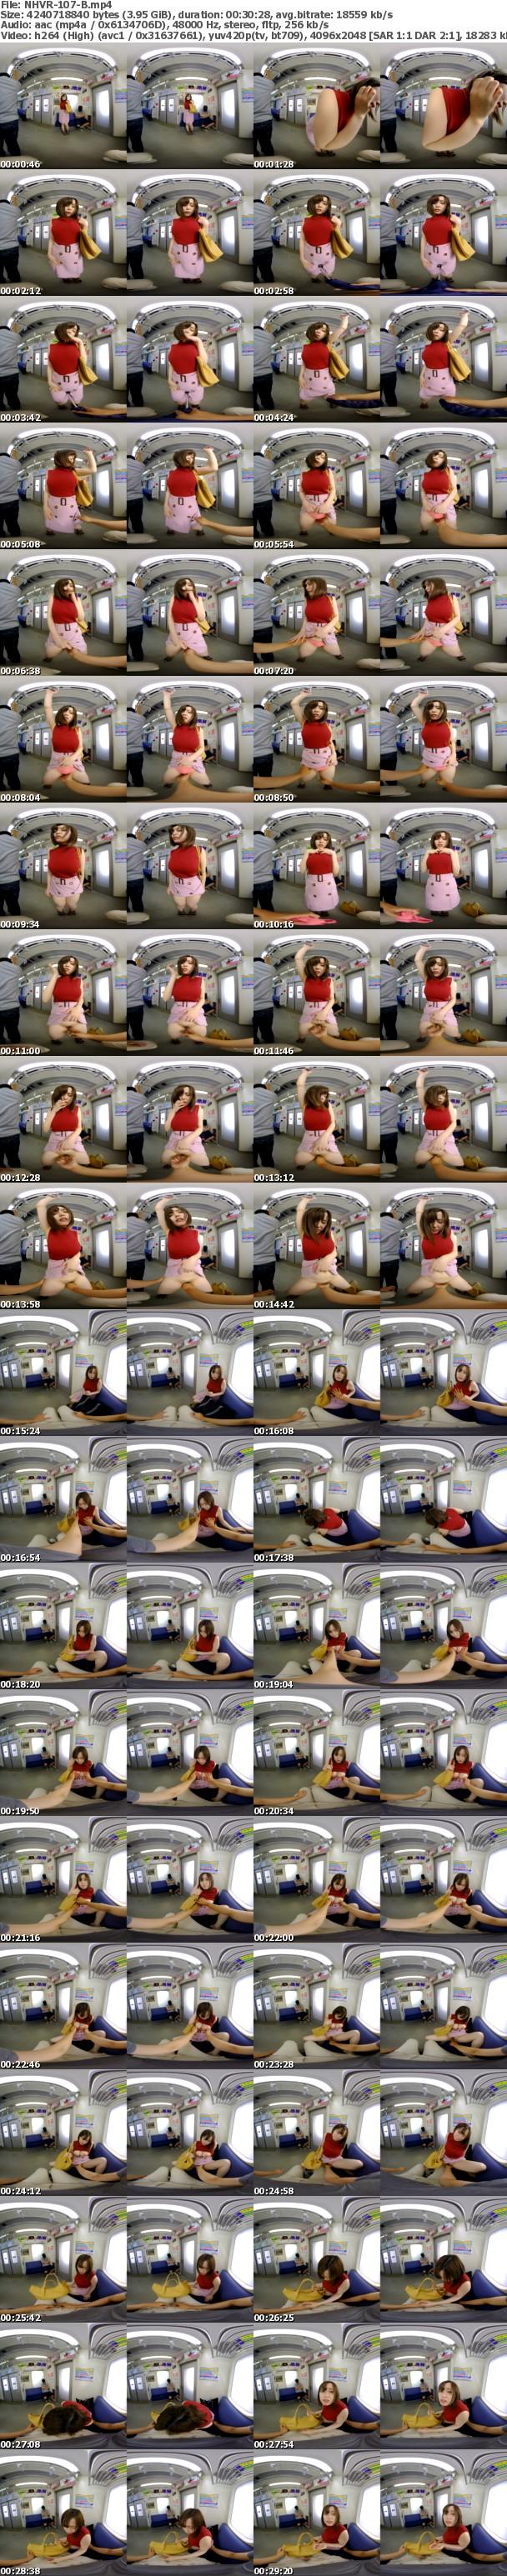 (VR) NHVR-107 痴●OK娘VRスペシャル 嫌なのにイカされた快感が忘れられず痴●プレイにハマった言いなり巨乳女子大生